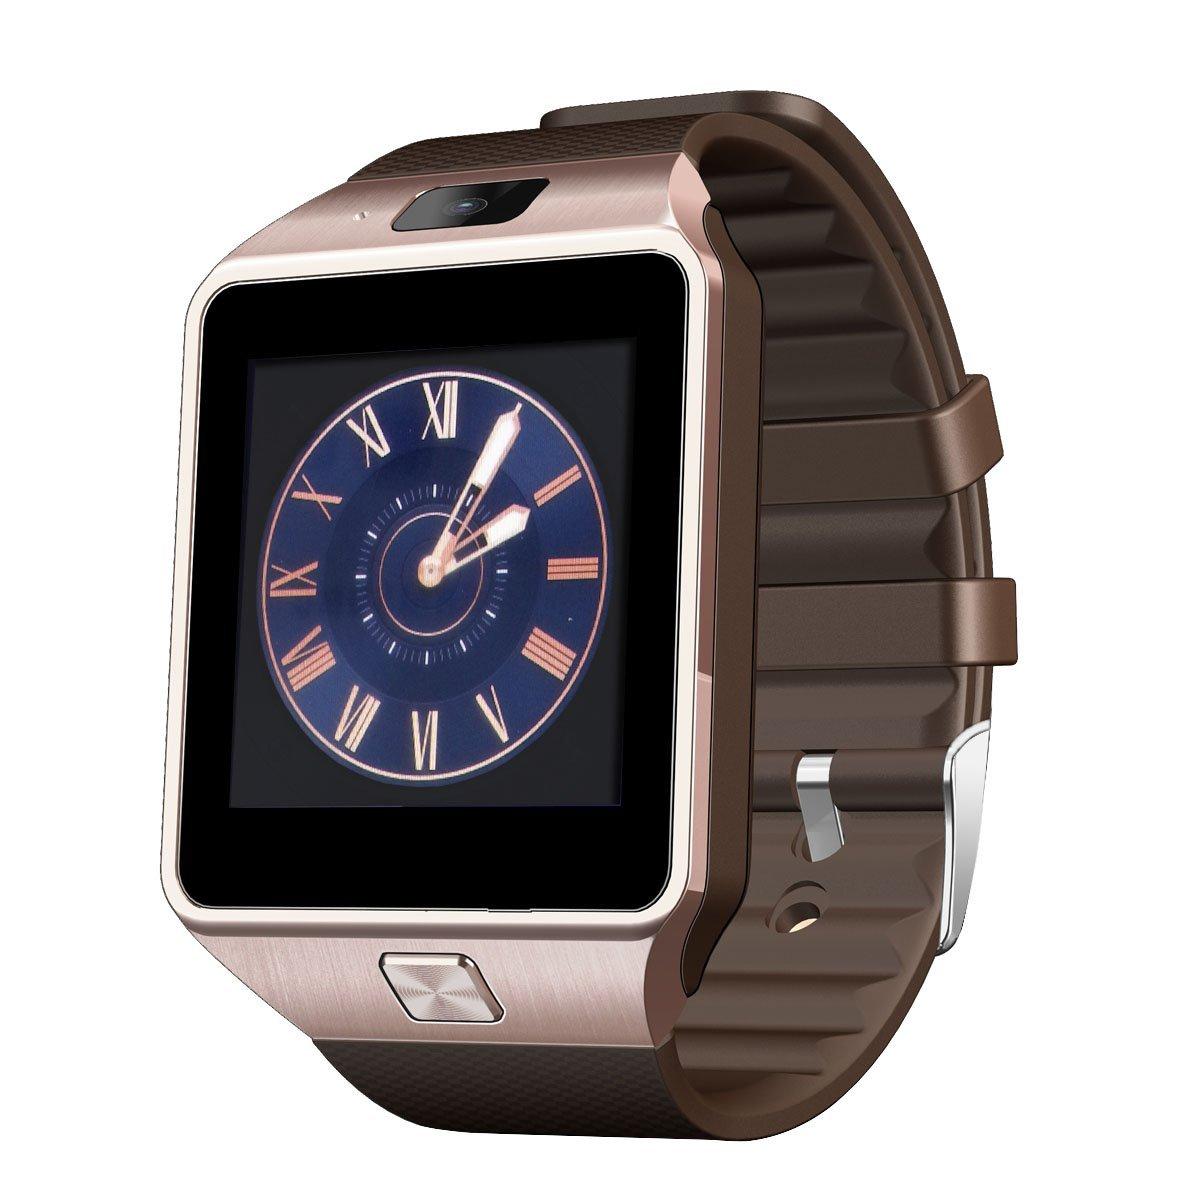 Otium Gear S Bluetooth Smart Watch WristWatch Sim insert anti-lost Call reminder Phone Mate Reviews